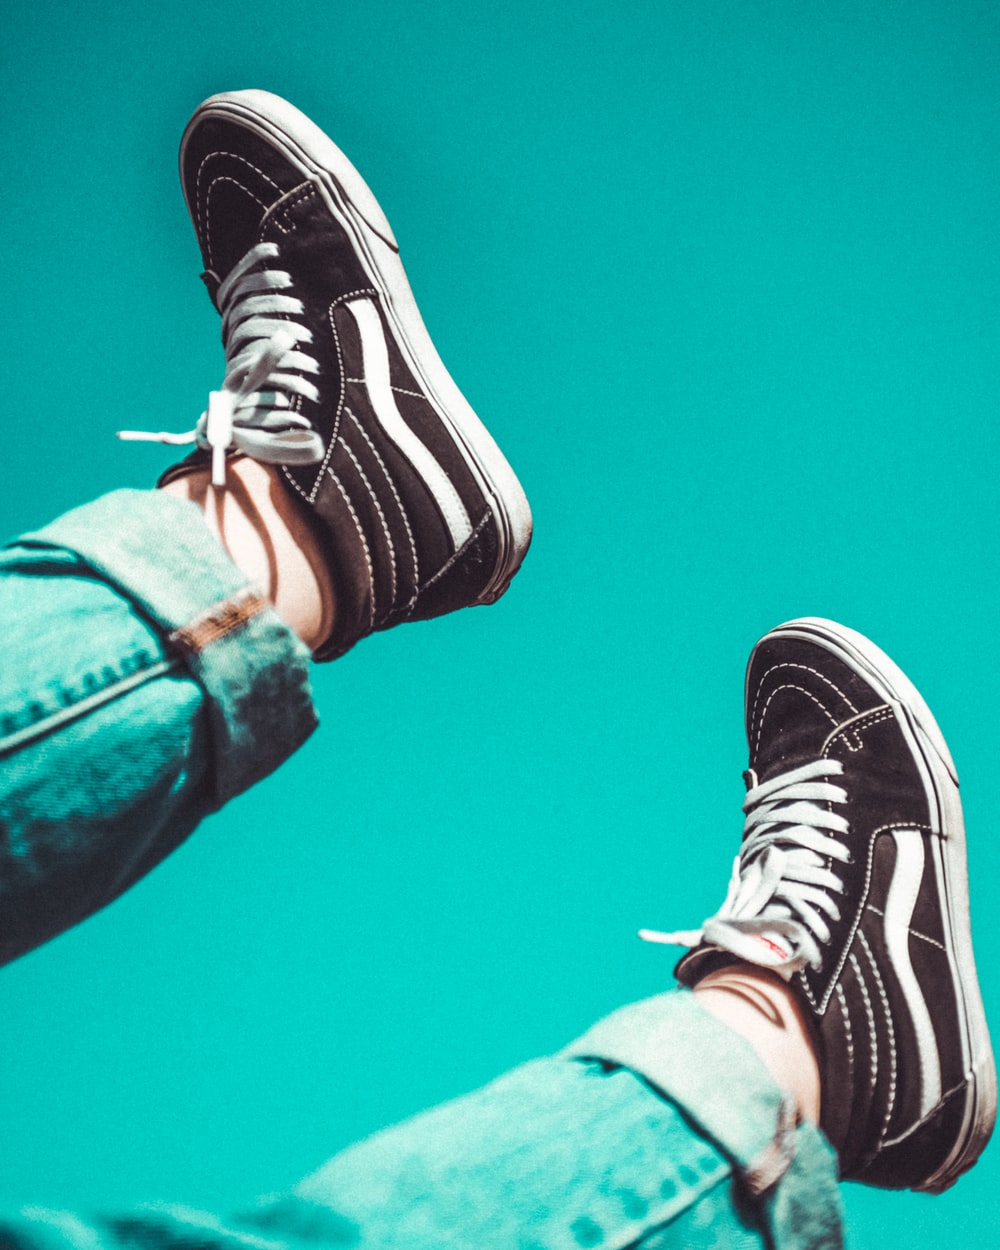 person wearing black-and-white Vans Sk8-Hi sneakers